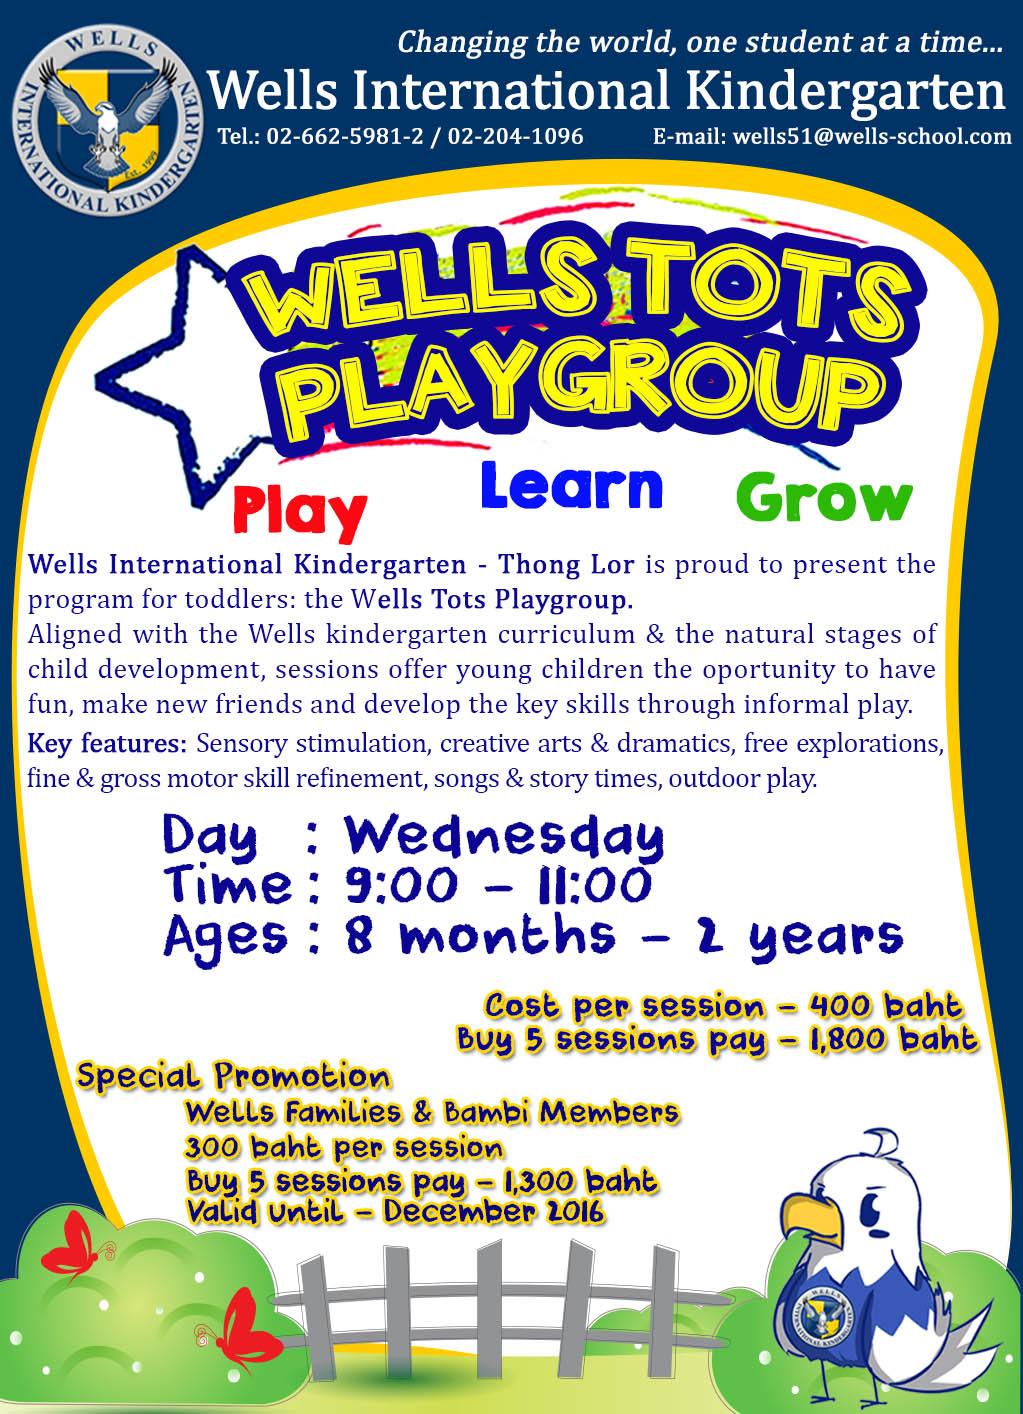 2016 Playgroup Program